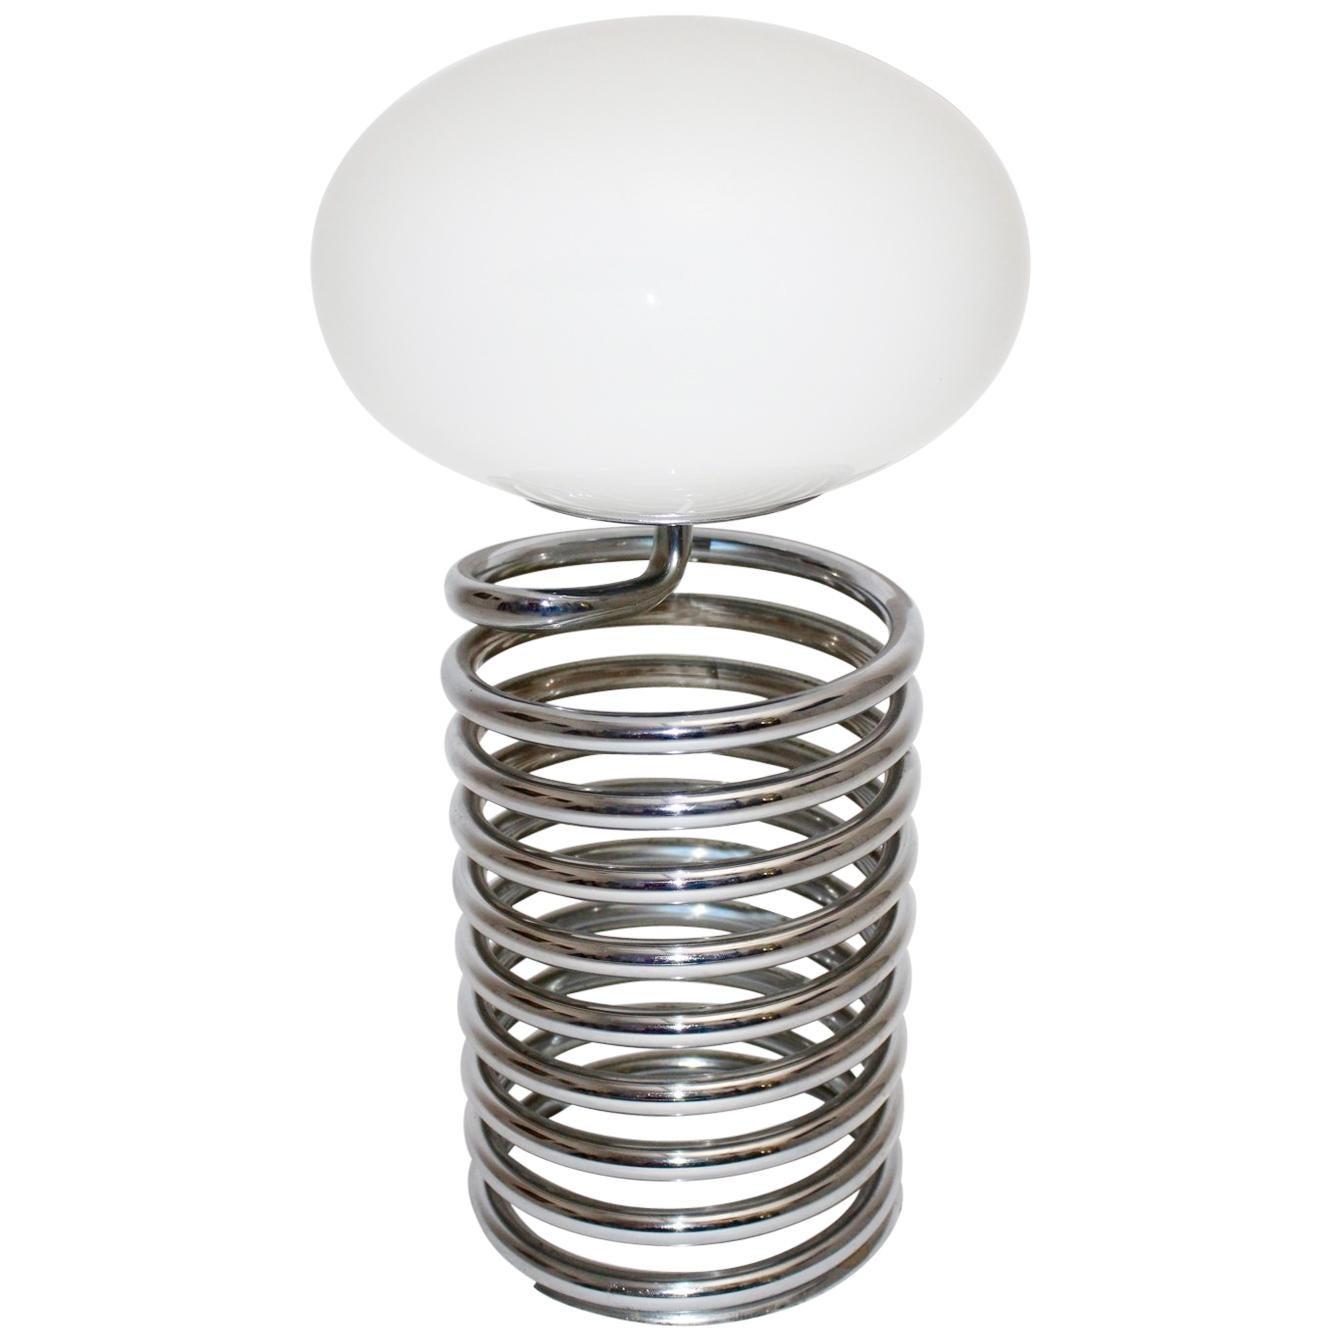 Mid-Century Modern Vintage Steel Spring Table Lamp by Ingo Maurer, Germany, 1968